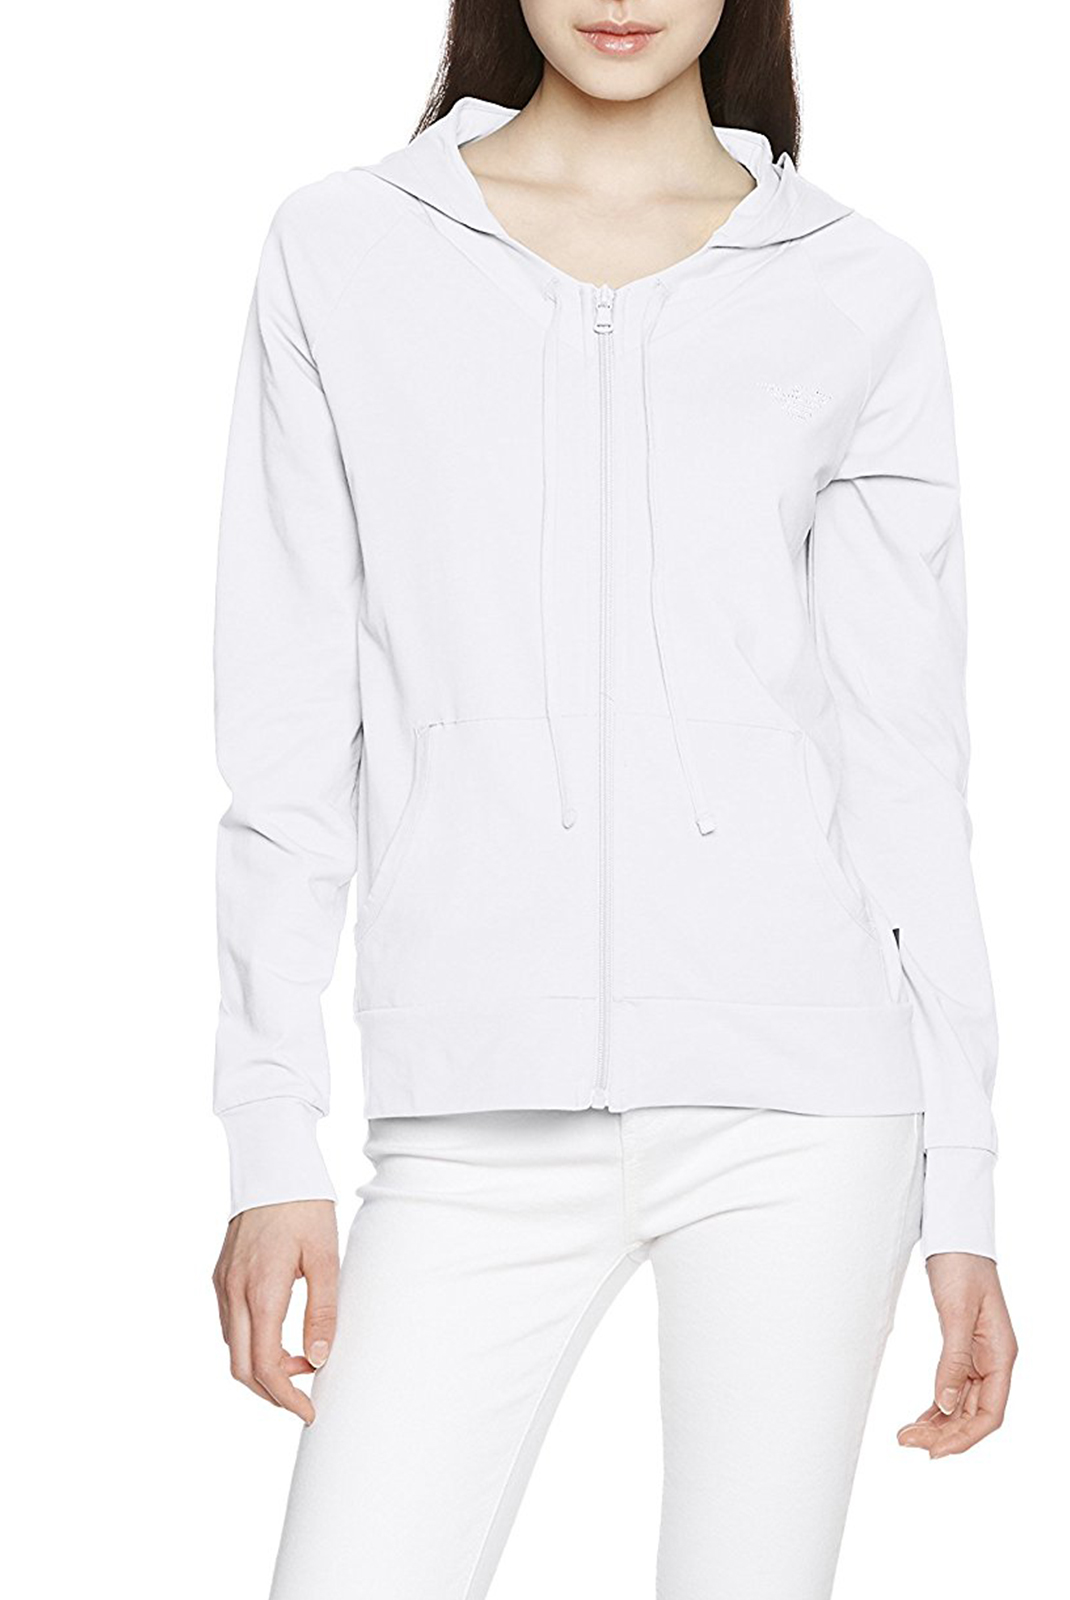 Veste streetwear  Emporio armani 163891 7P263 00010 WHITE